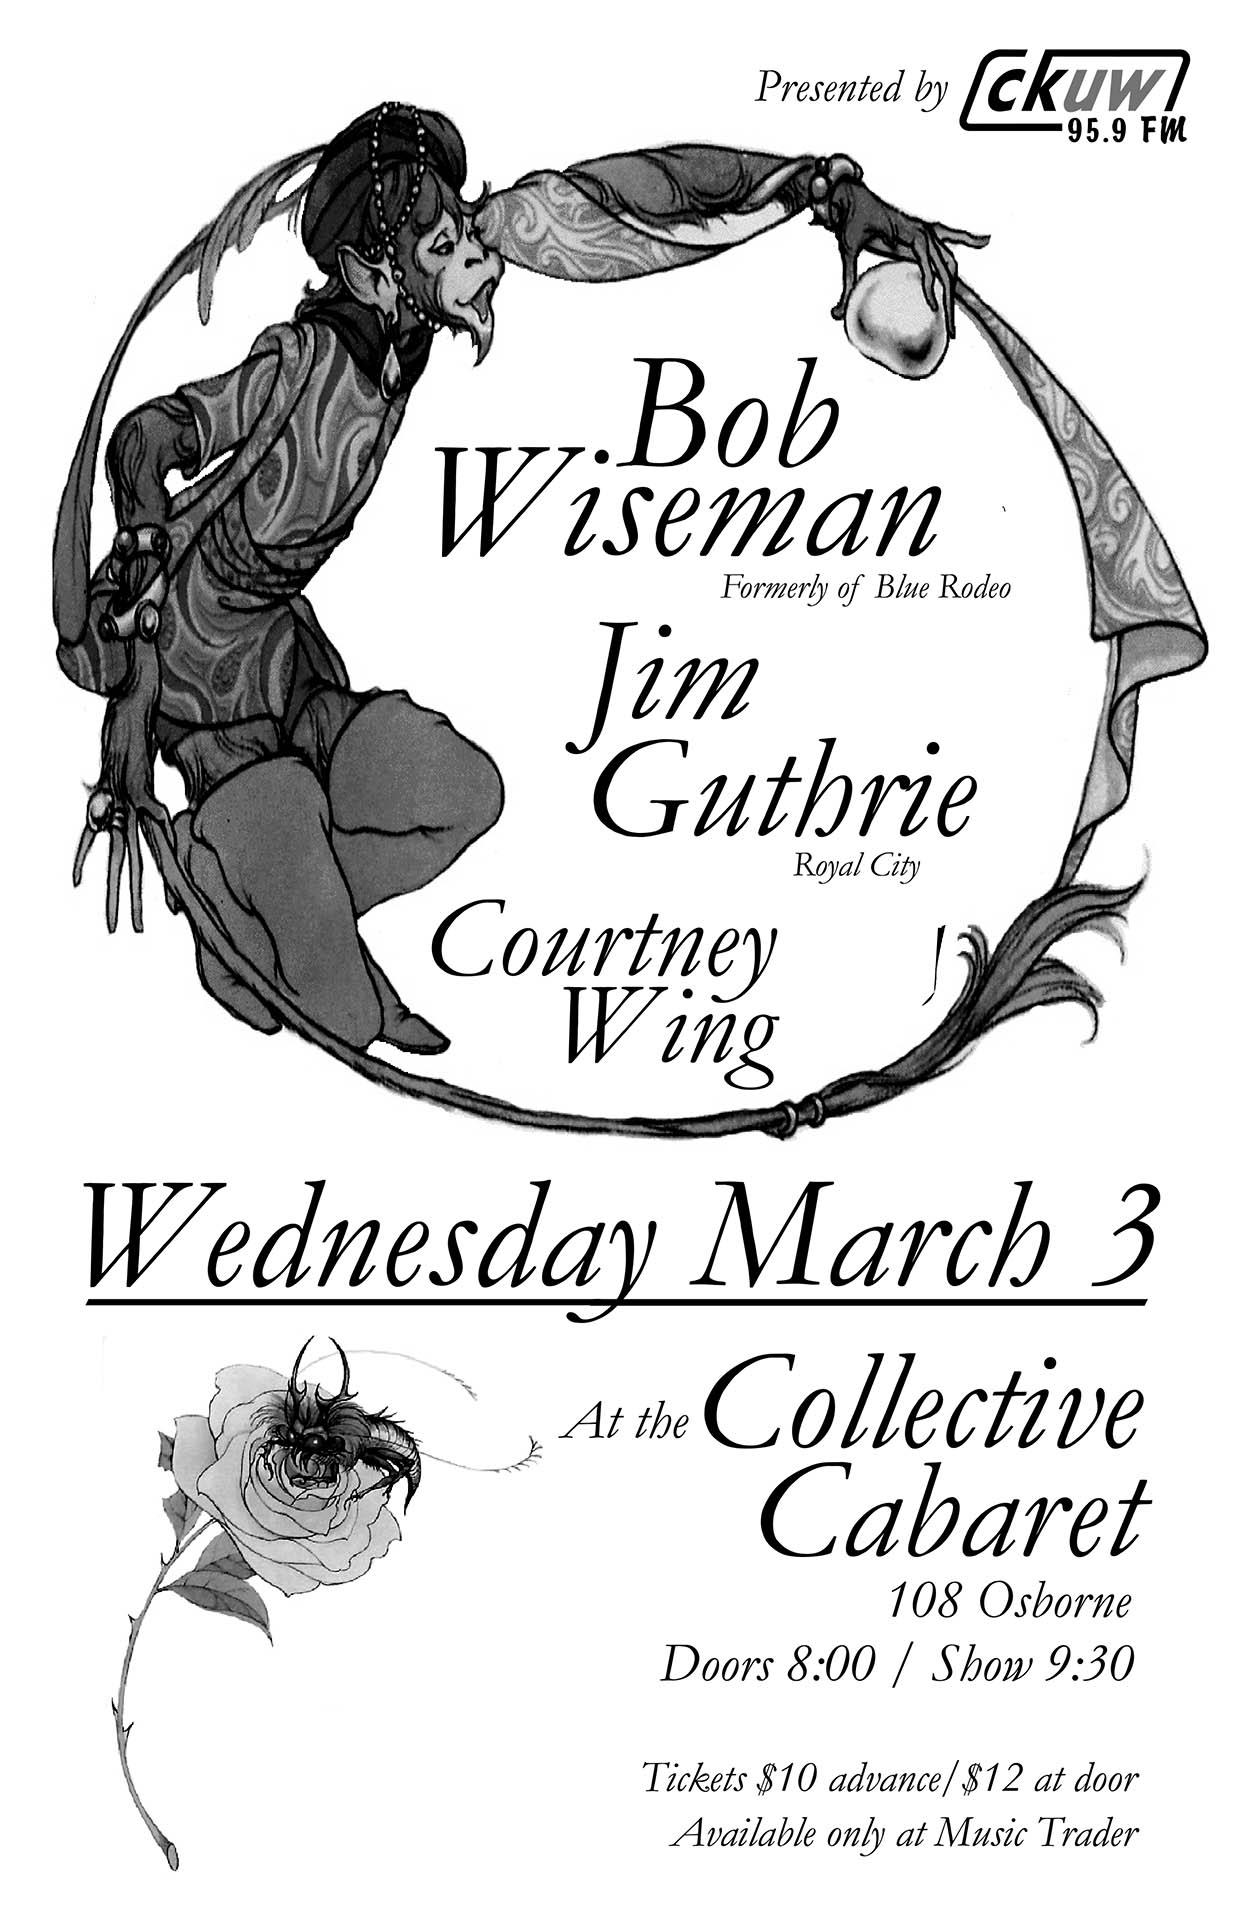 Bob Wiseman - 2004